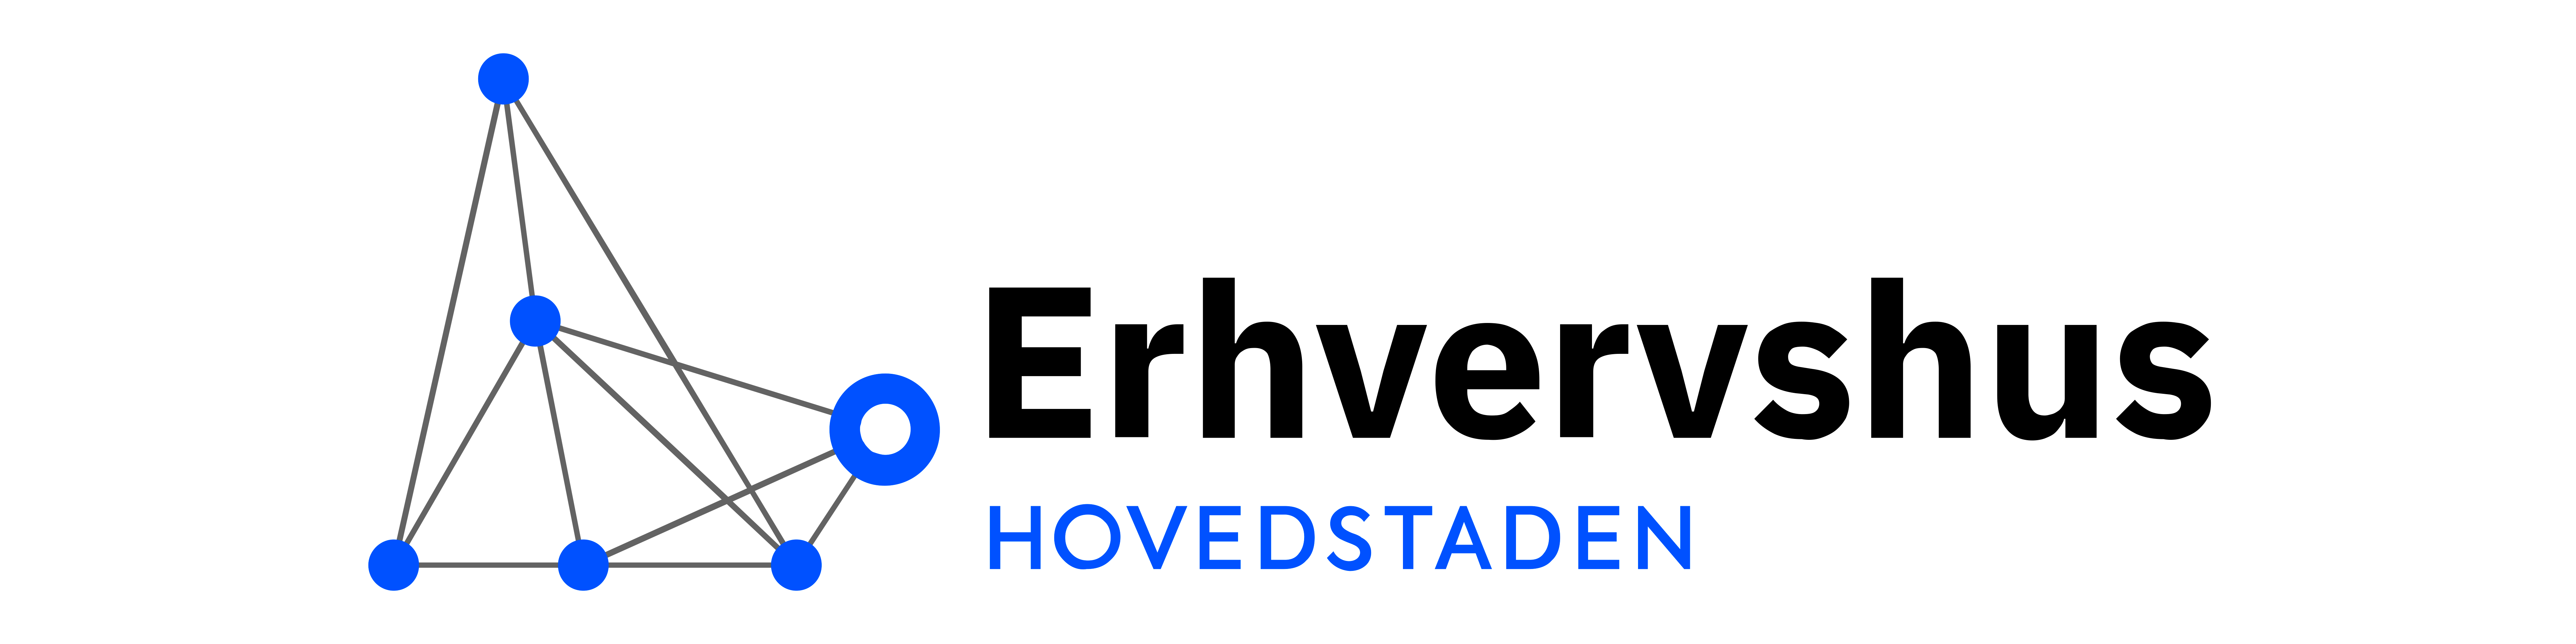 Copenhagen Business Hub